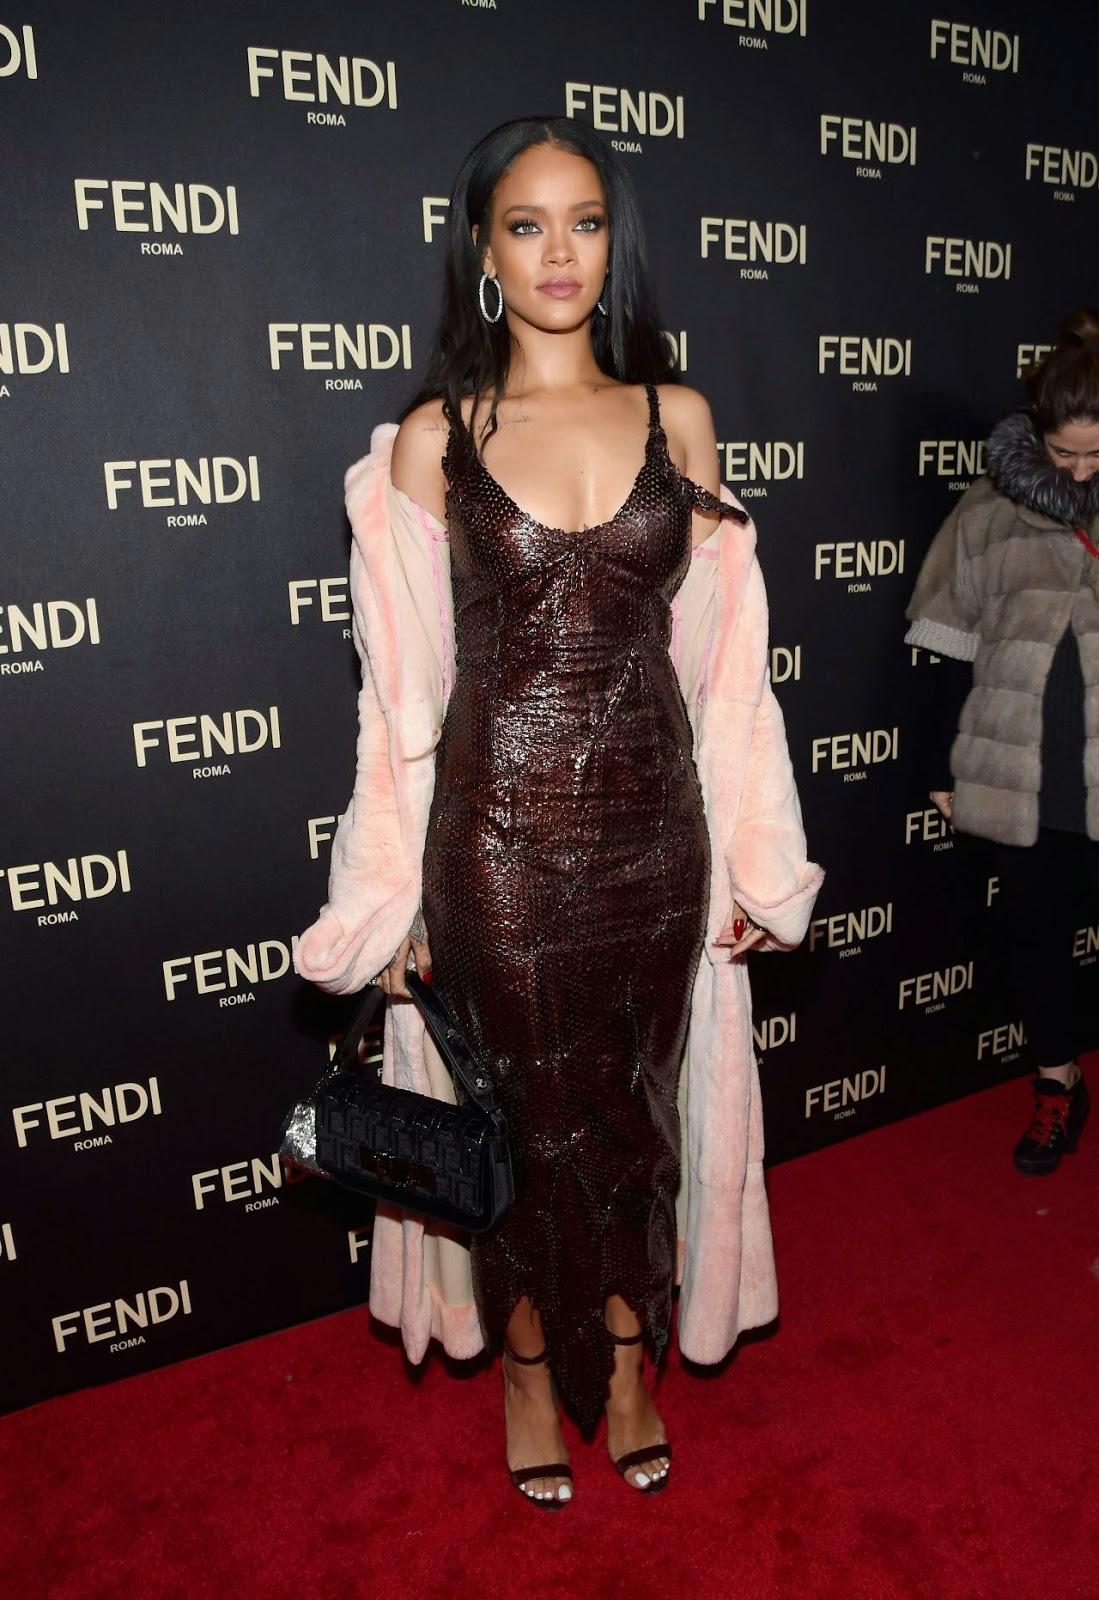 Rihanna In A Slinky Dress At The Fendi New York Flagship